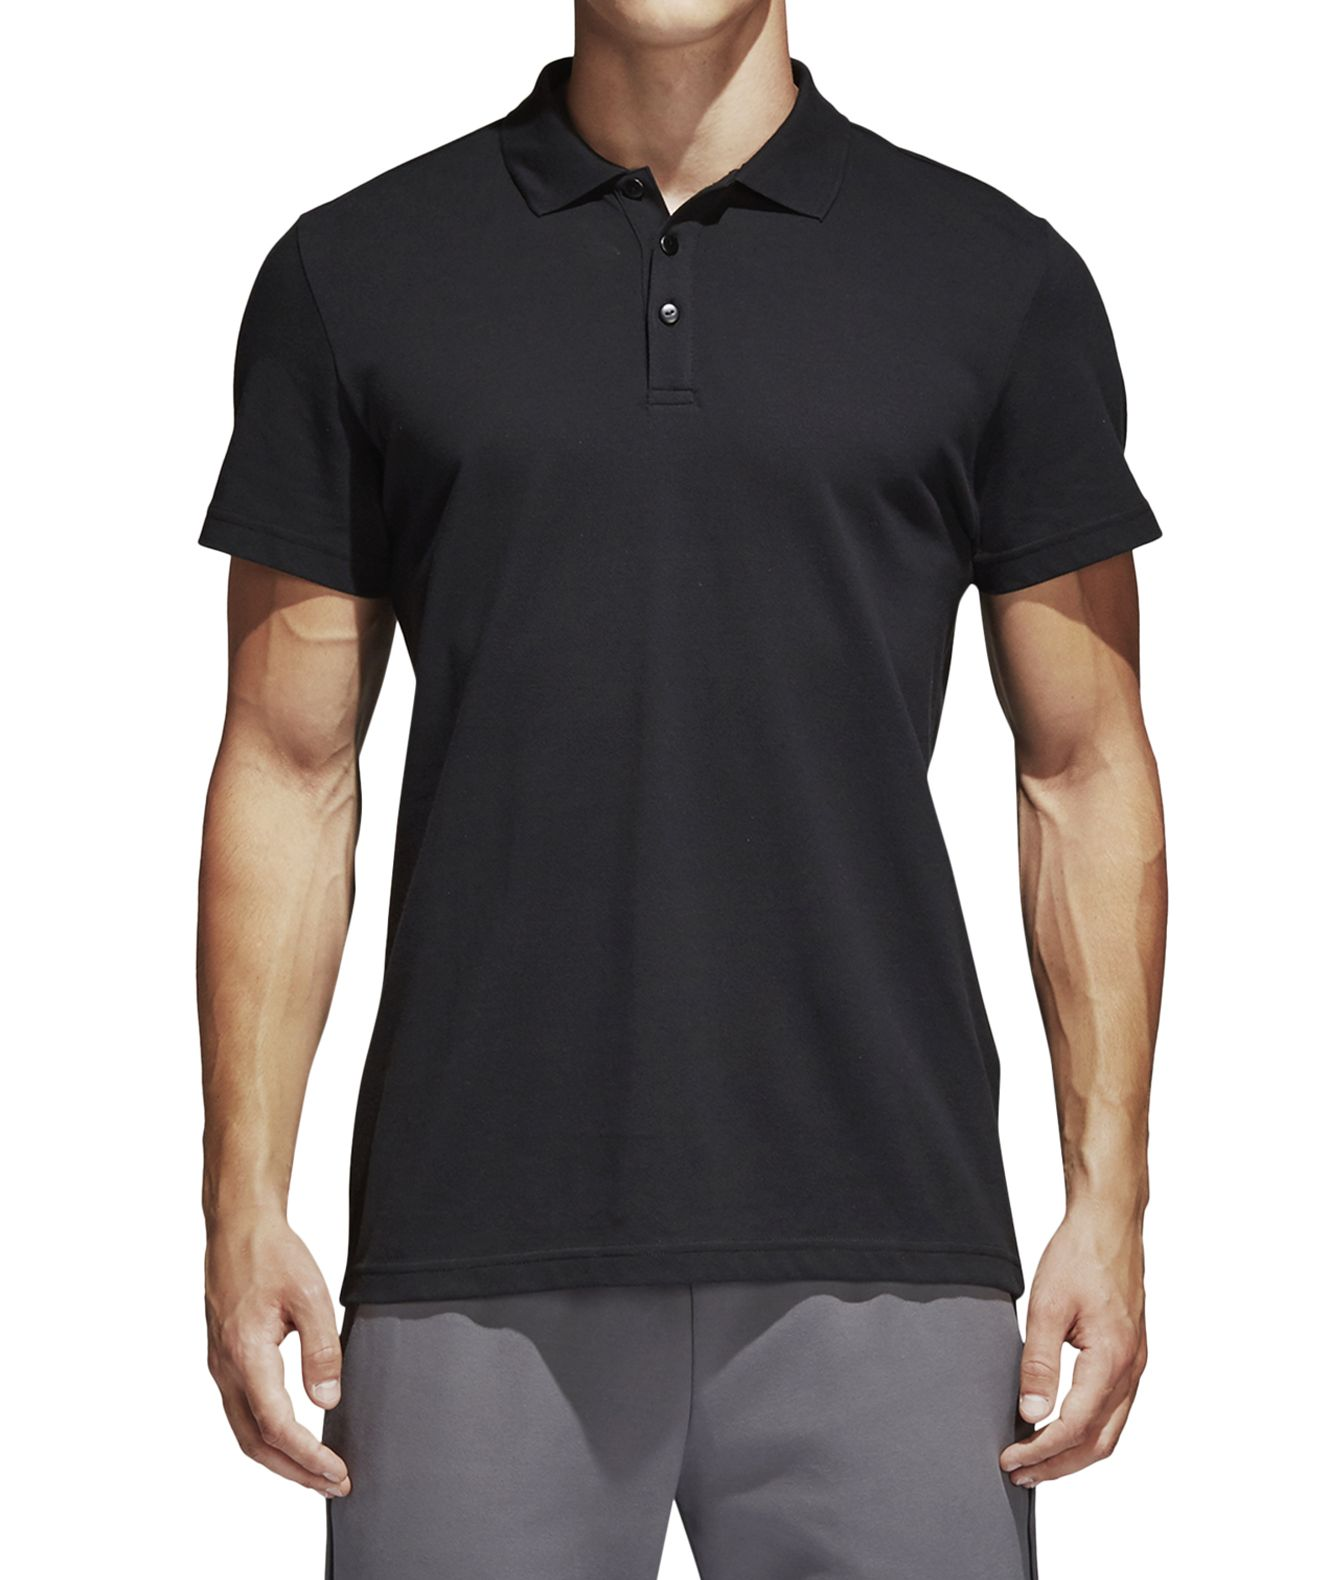 6c6e085d12416 koszulka męska polo adidas r XL S98751 7526812706 - Allegro.pl - Więcej niż  aukcje.